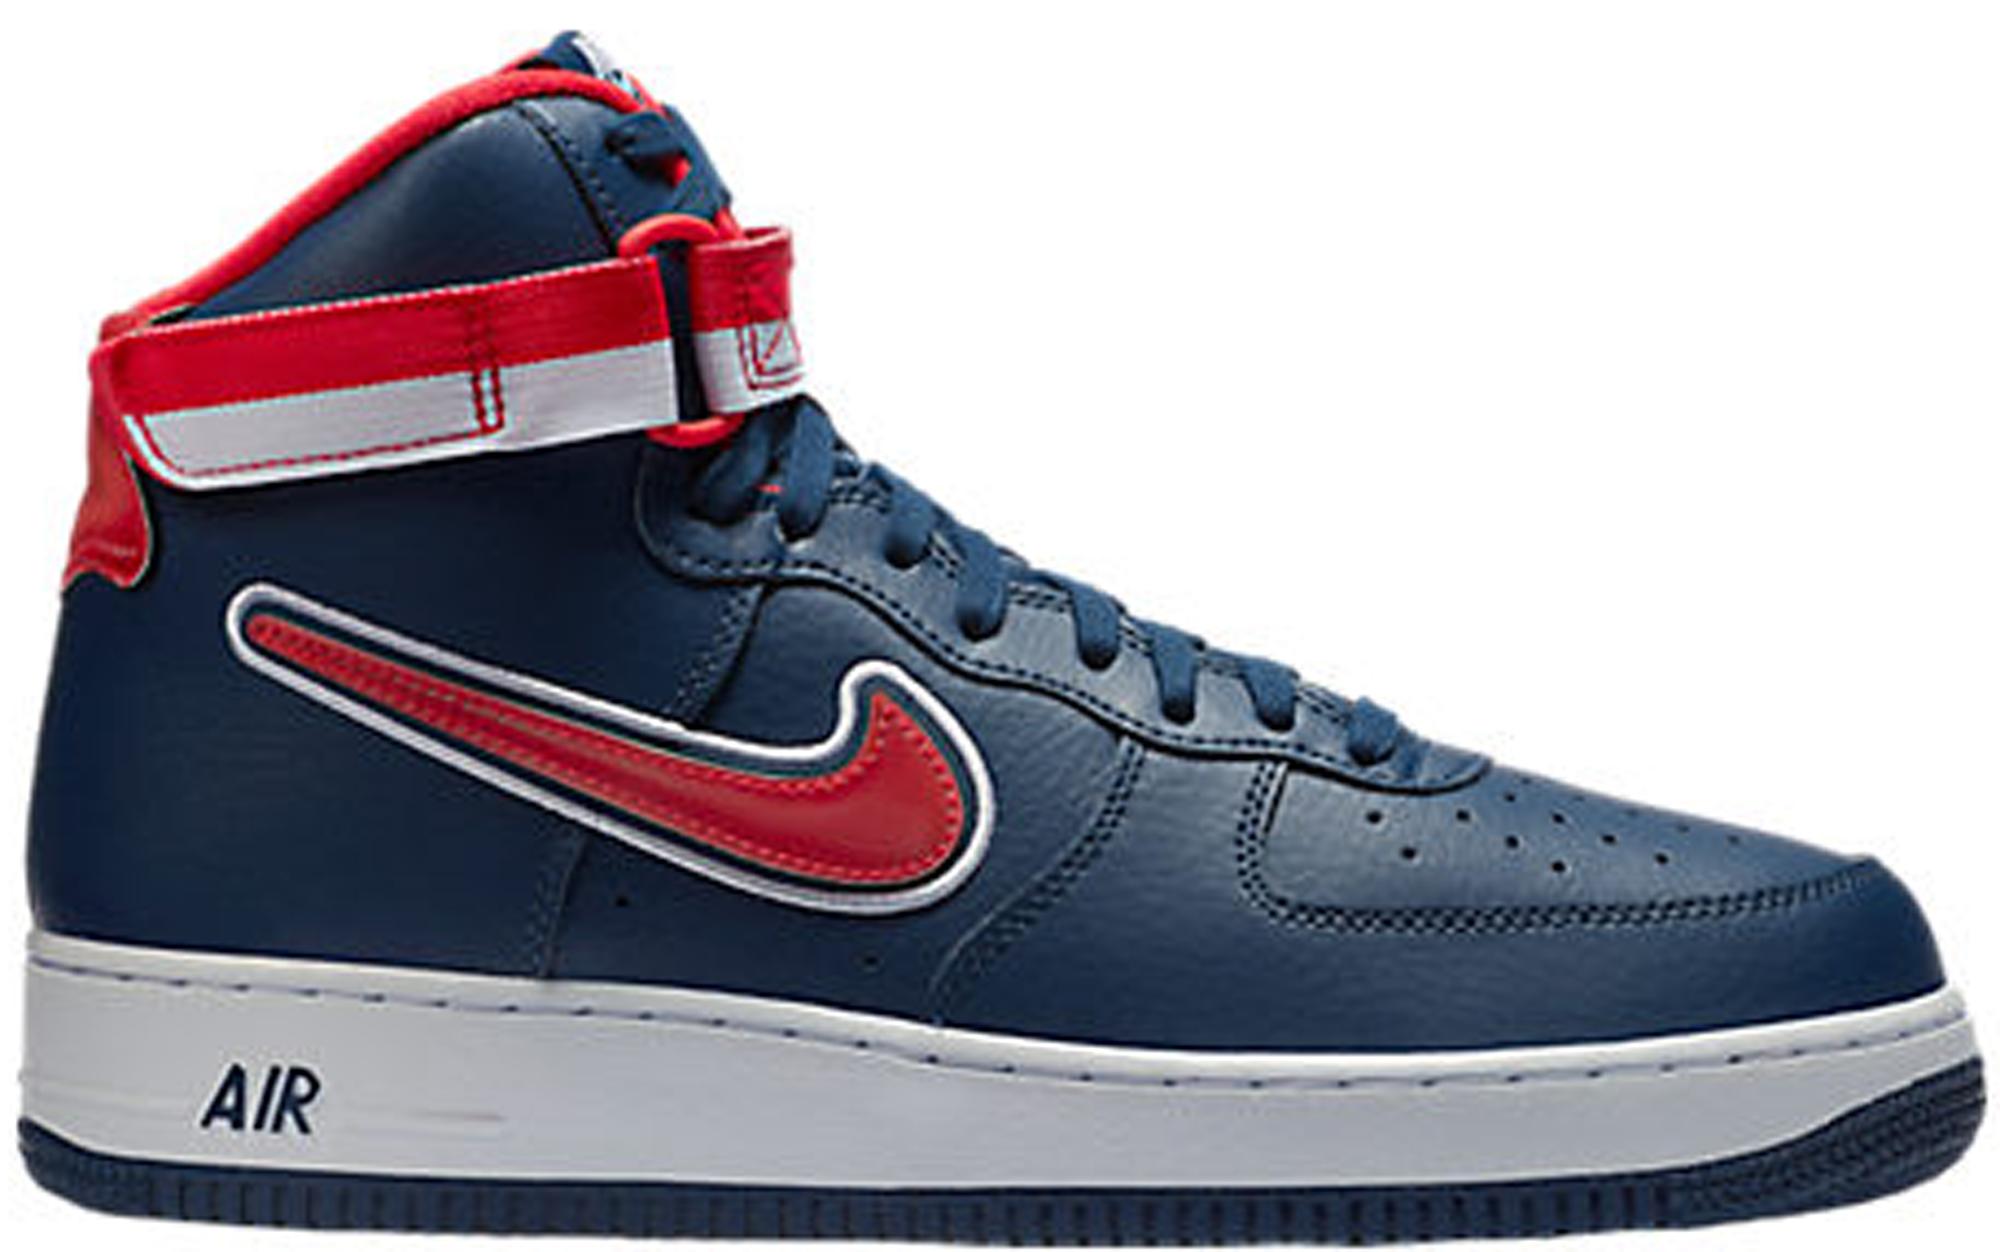 Nike Air Force 1 High NBA Midnight Navy